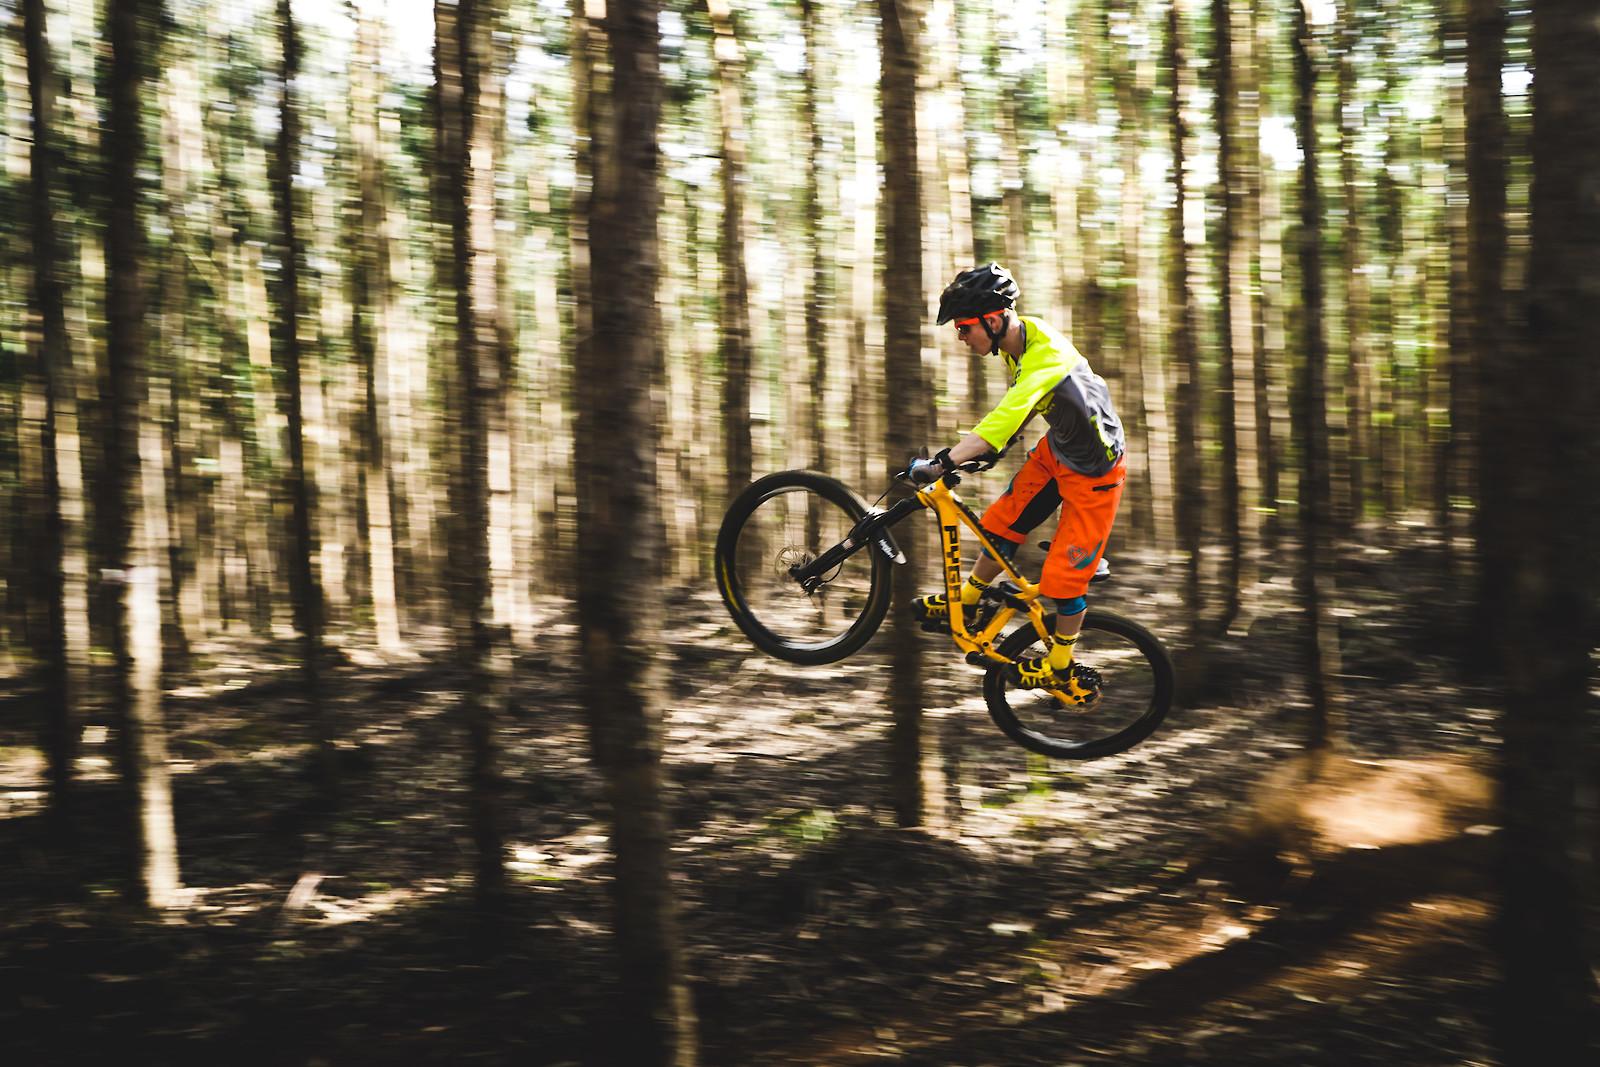 Pyga Panning - Its.Peteee - Mountain Biking Pictures - Vital MTB